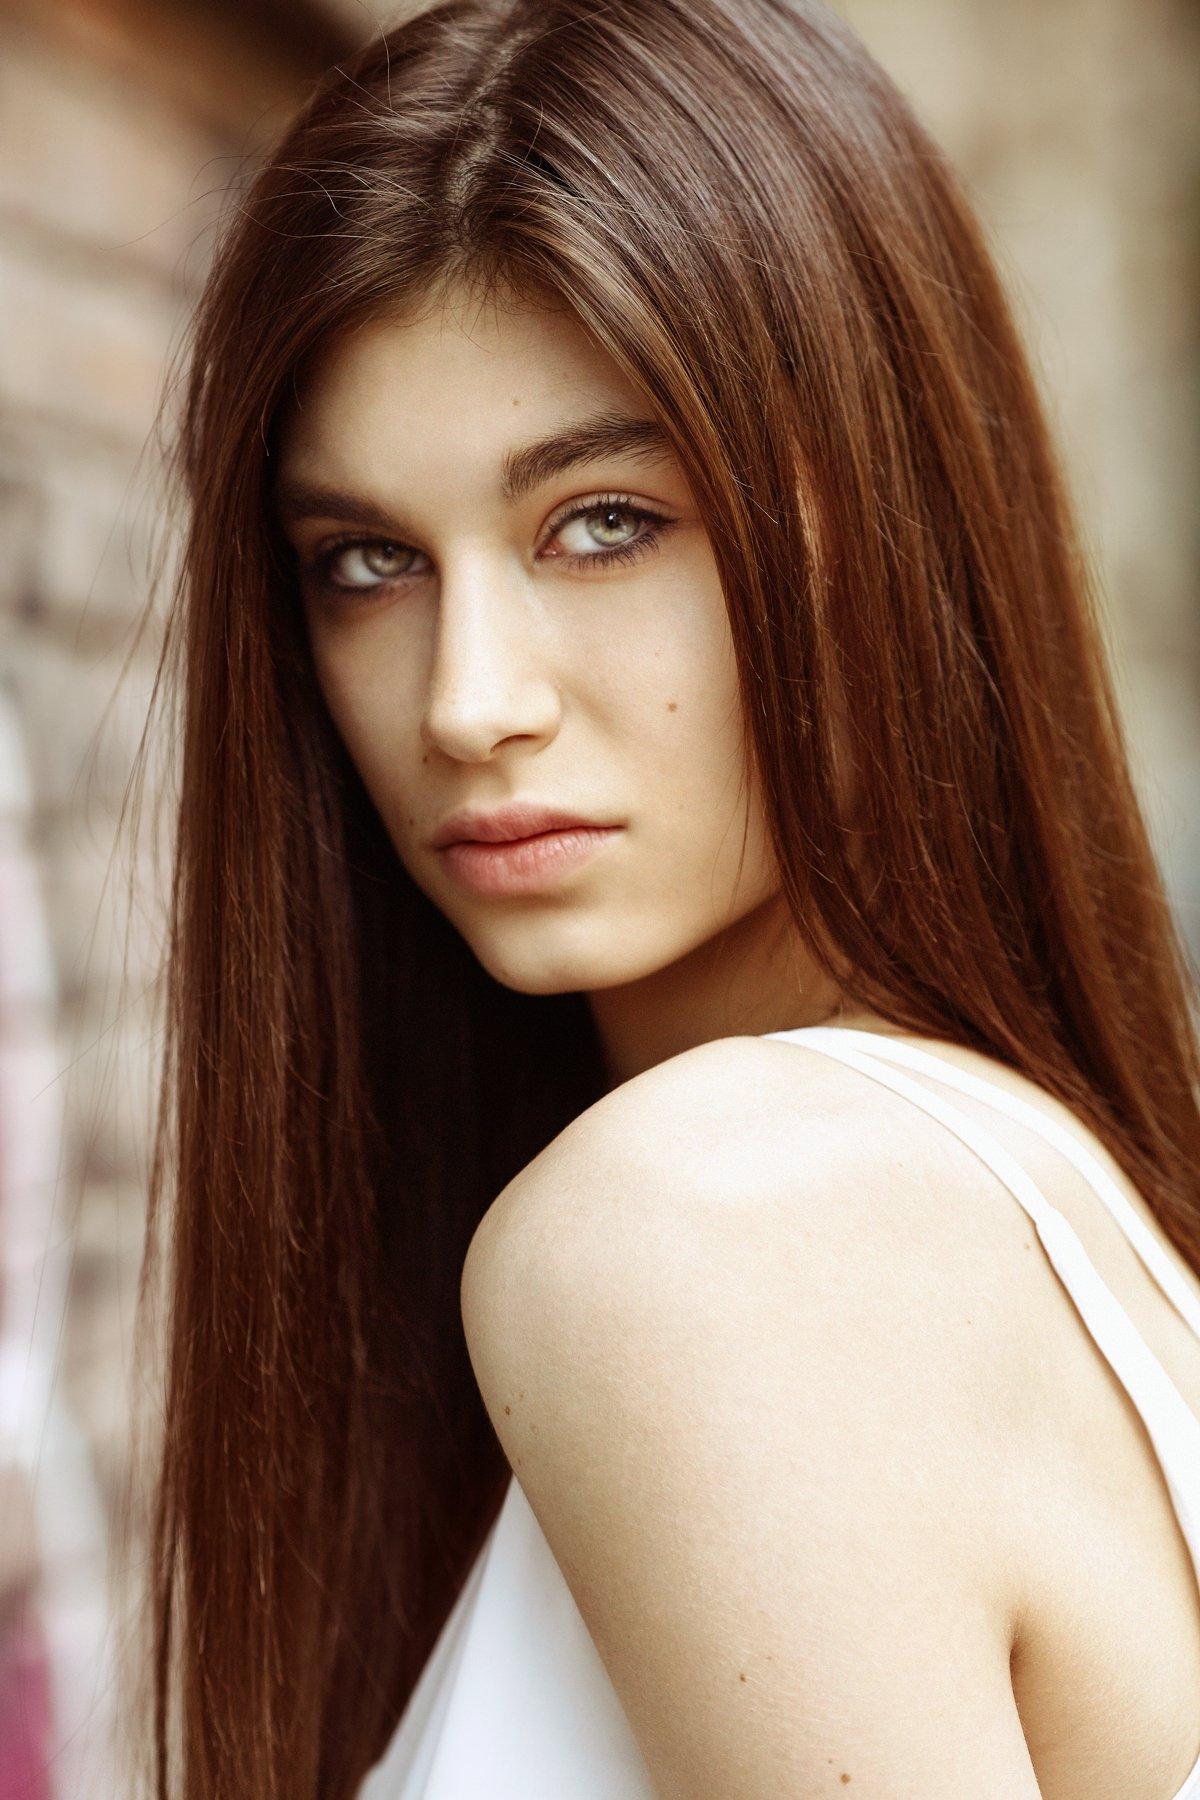 light, Asen Andreev Photography, Asen Andreev, Portrait, Color Image, Pose, Model, Fashion, Natural Light, asen